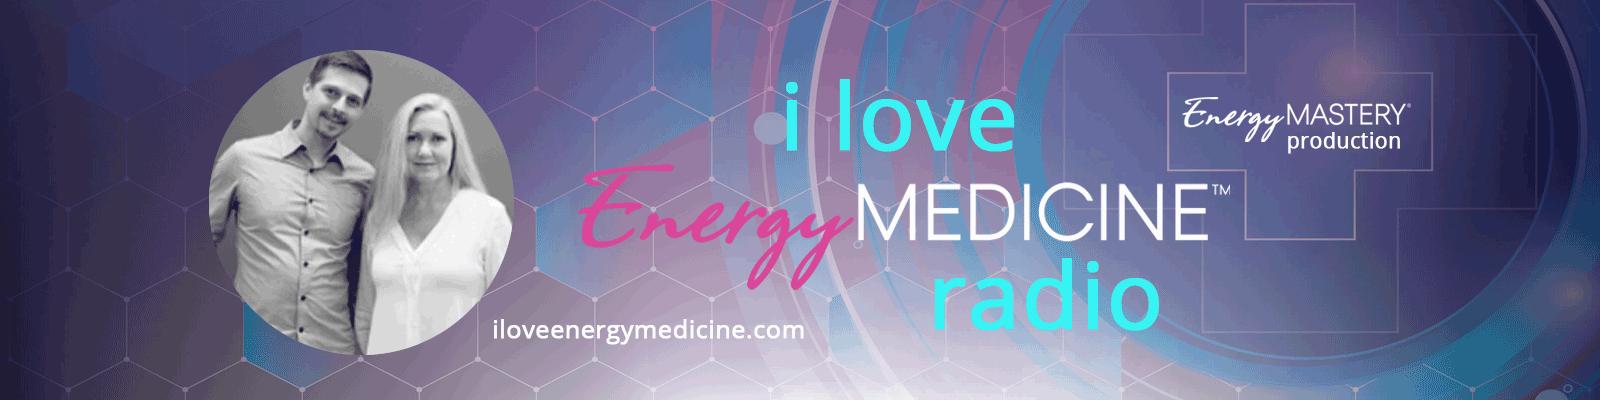 Web-Banner-I-love-energy-medicine-radio-e